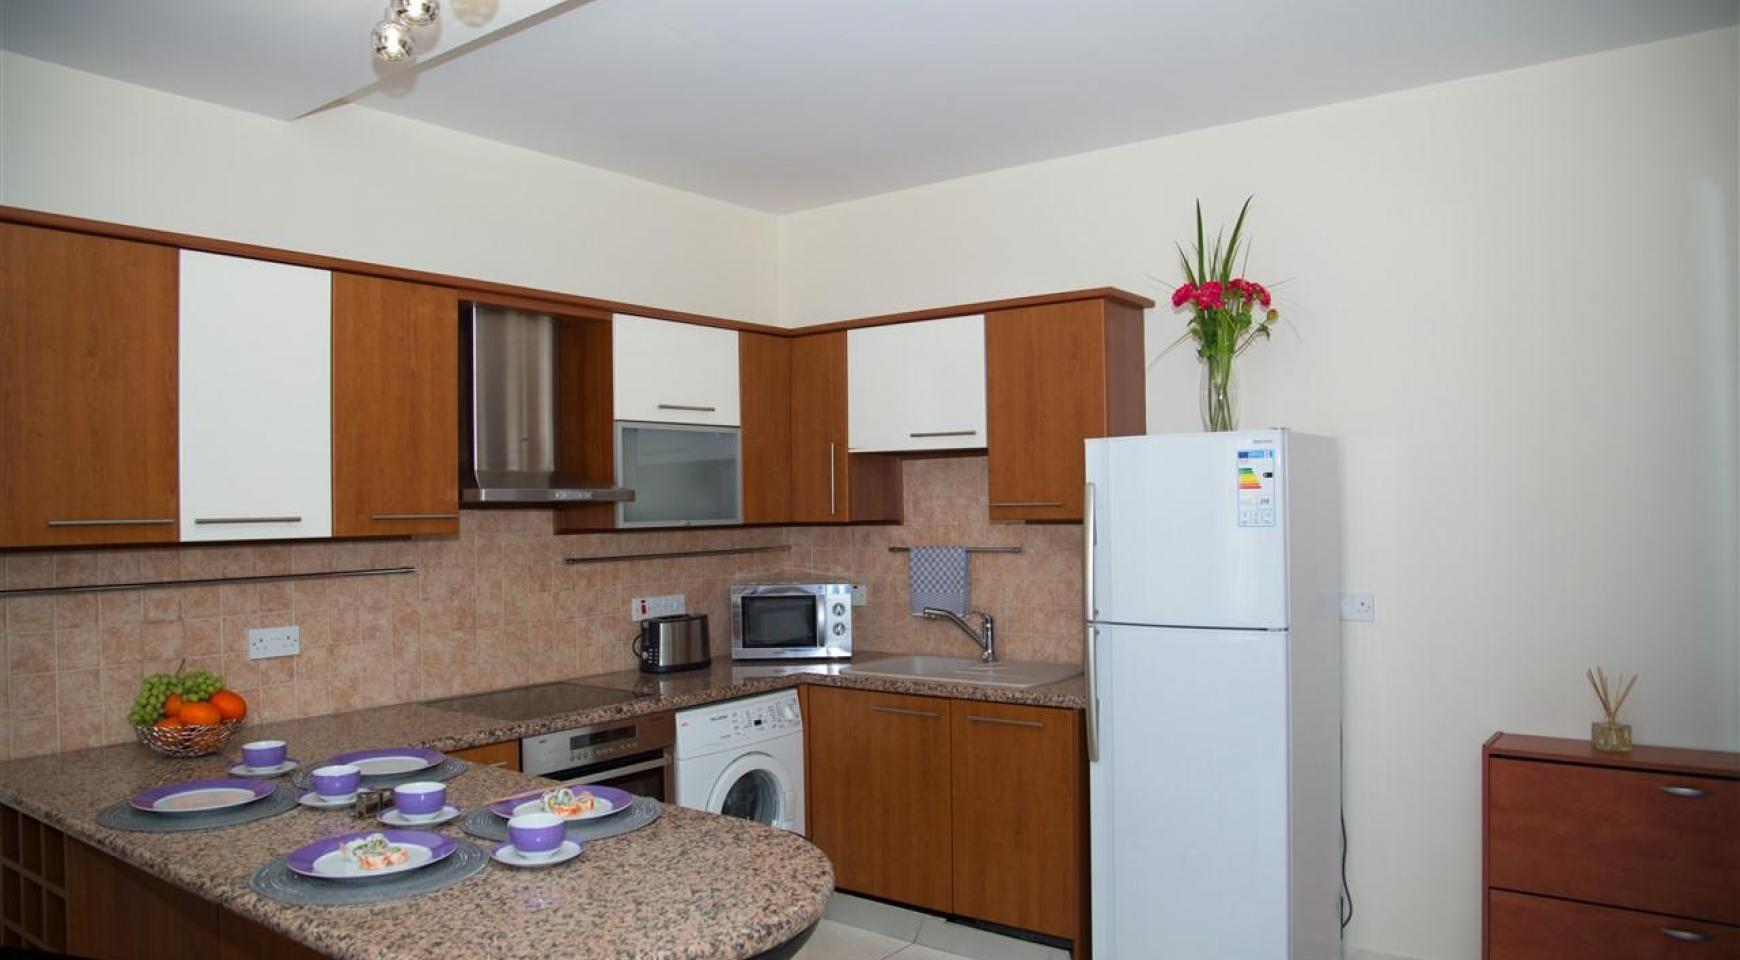 Luxury 2 Bedroom Apartment Mesogios Iris 304 in the Tourist area near the Beach - 10